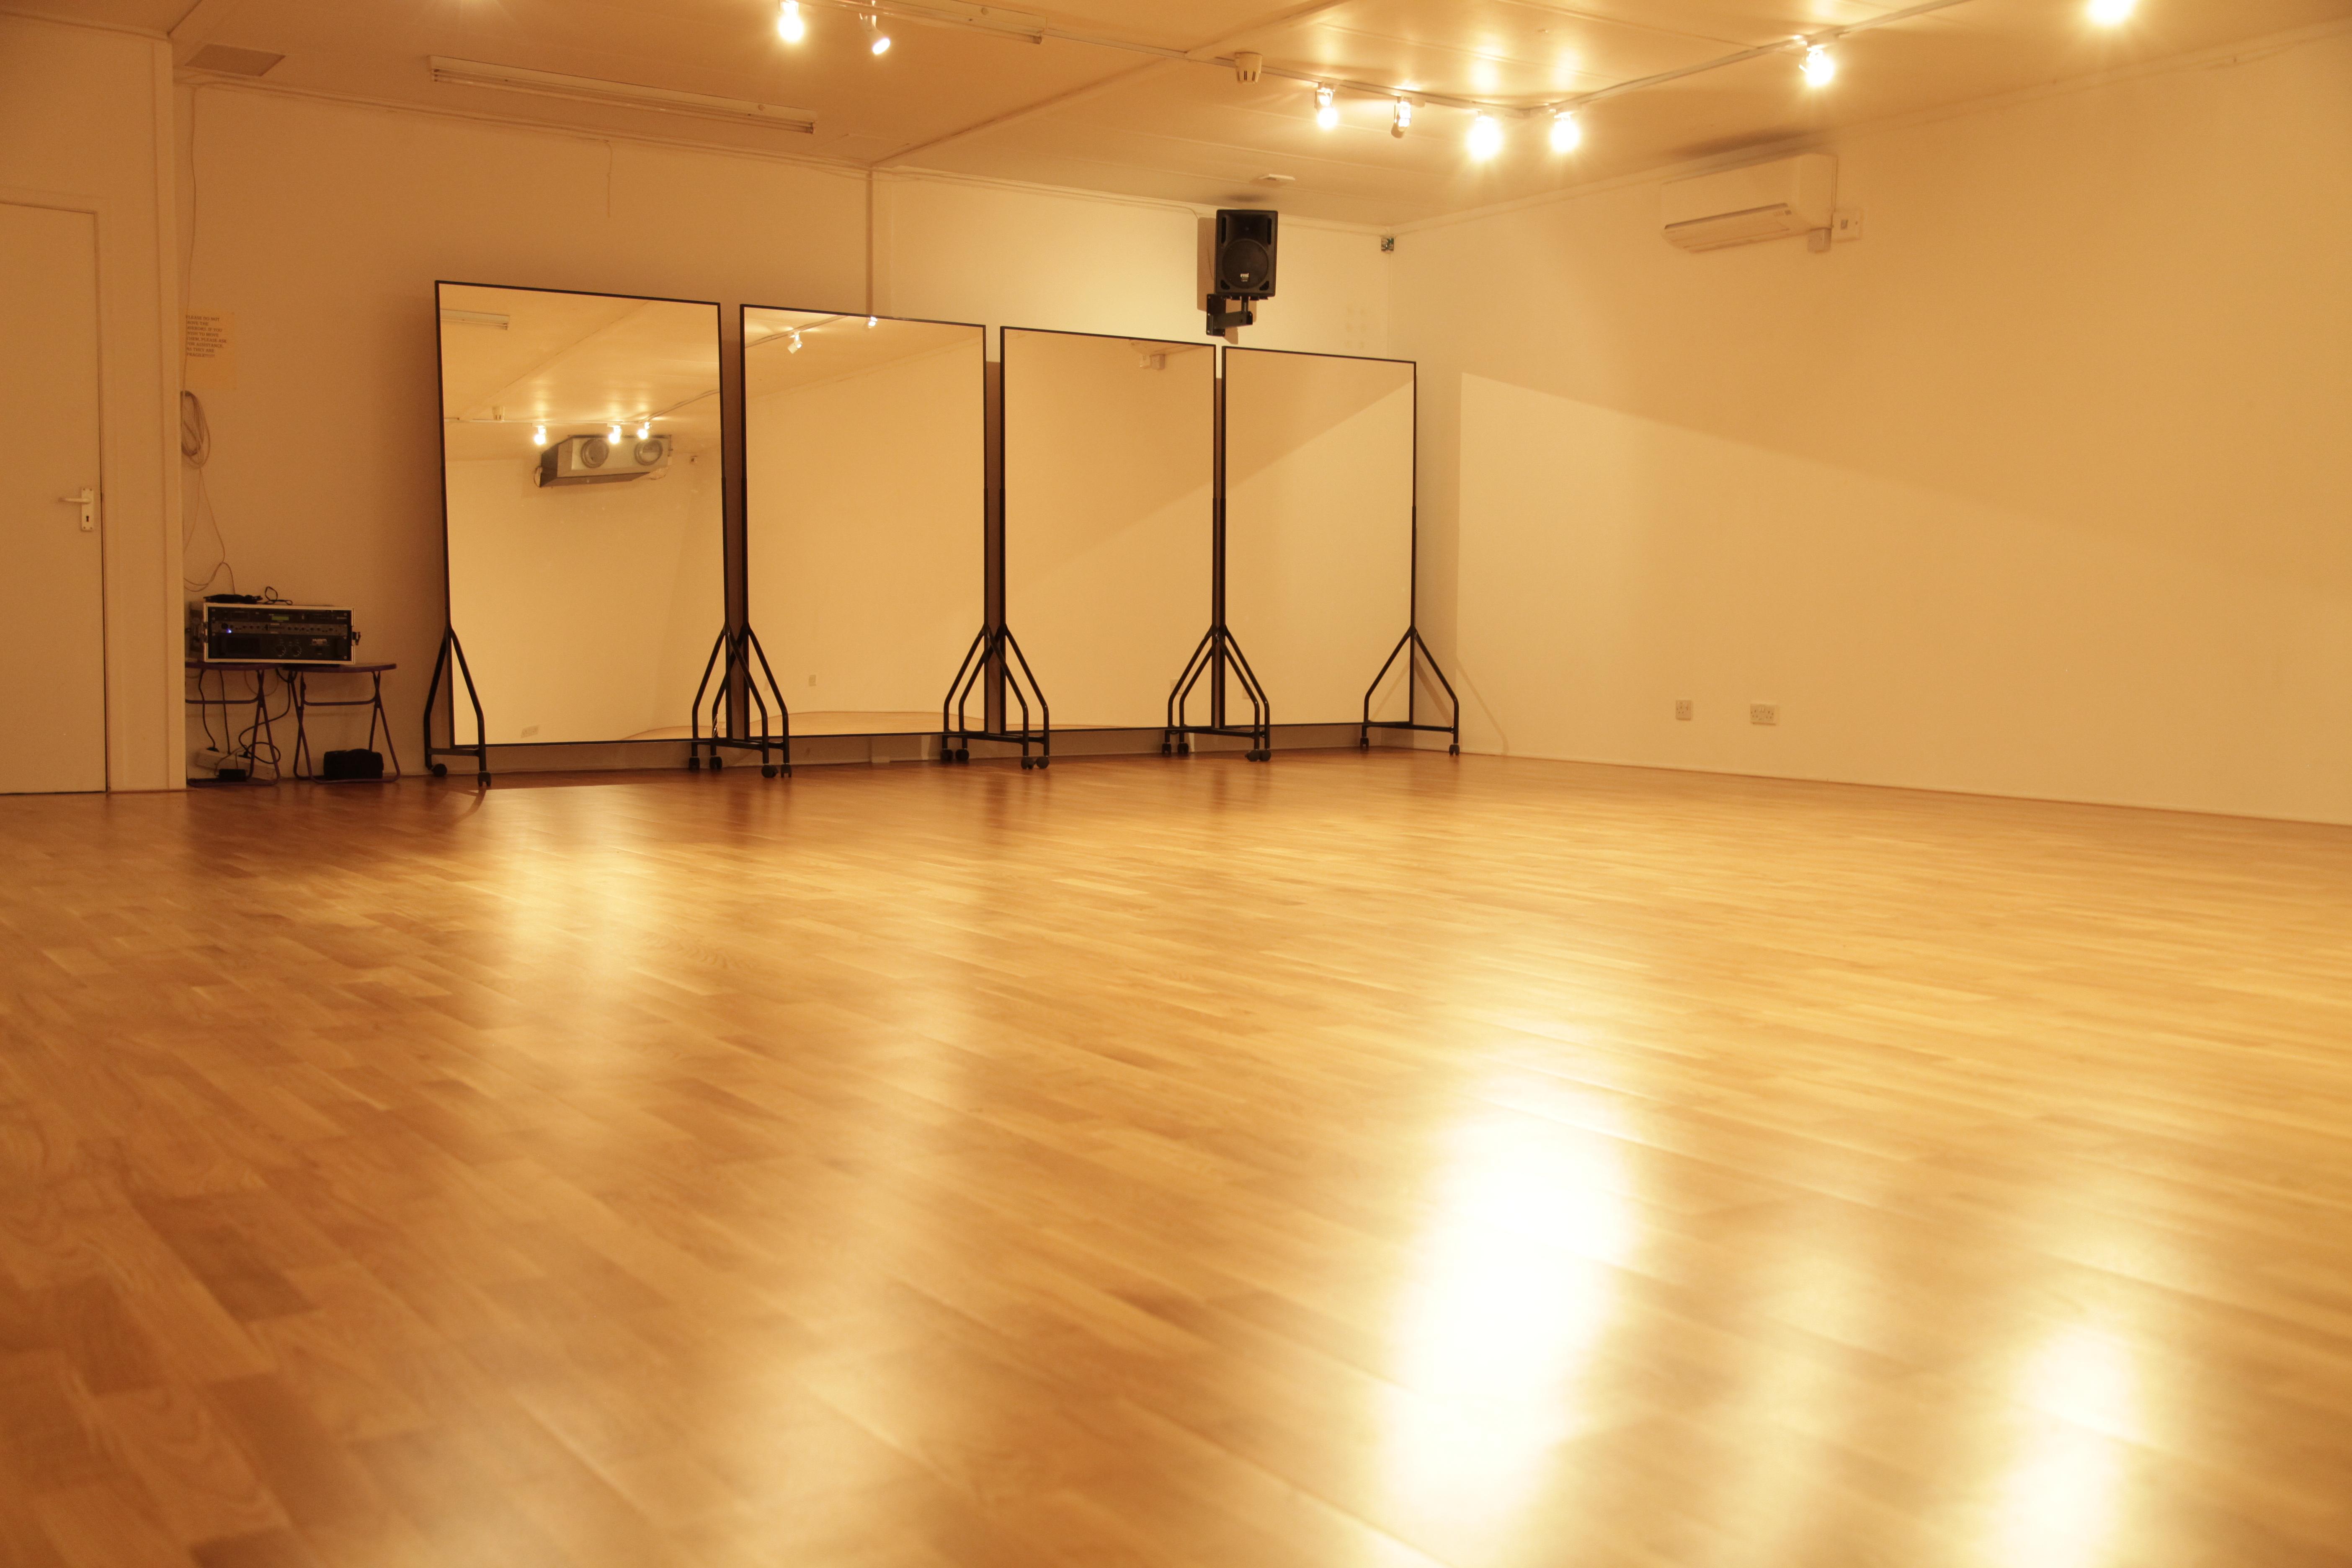 Studio pic 2-3